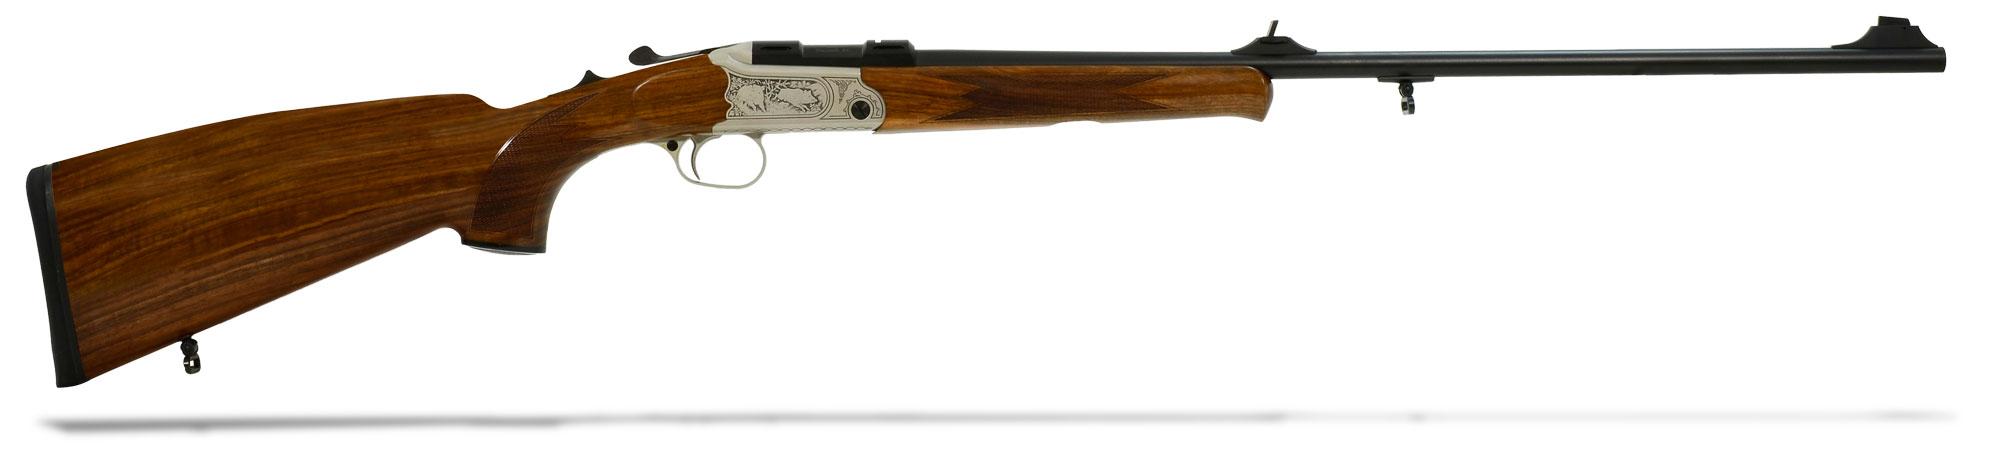 Merkel K3 Jagd 257 Wby Single Shot Rifle K3-Jagd-257